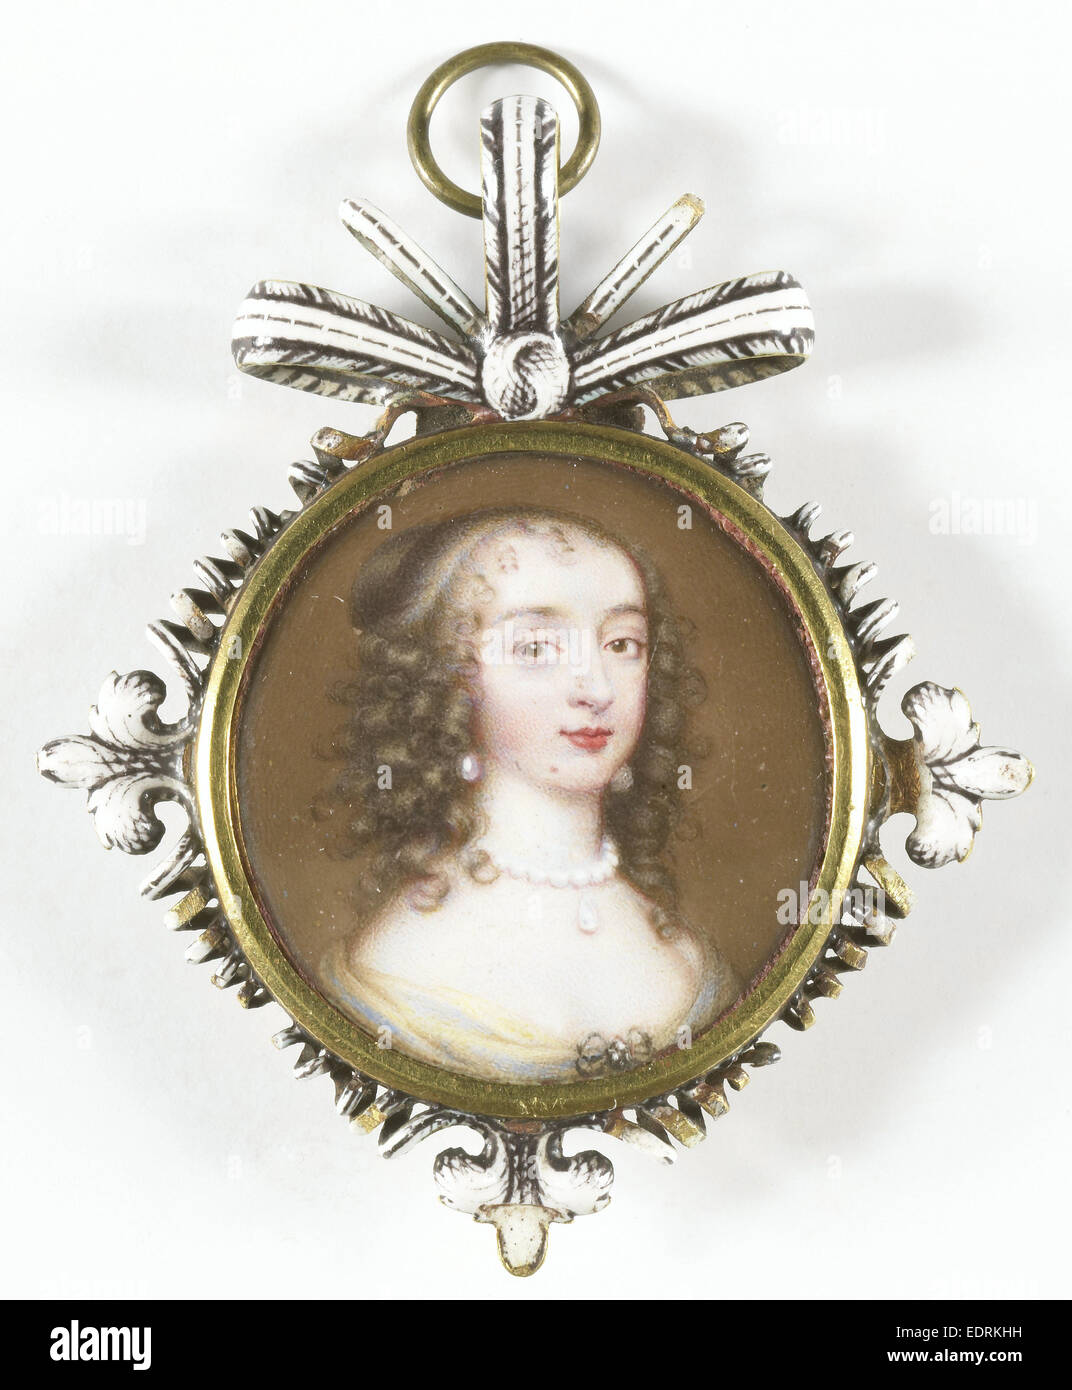 Maria Stuart, 1631-60, Wife of William II, attributed to Jean Petitot, le vieux, 1645 - 1650, Portrait miniature - Stock Image